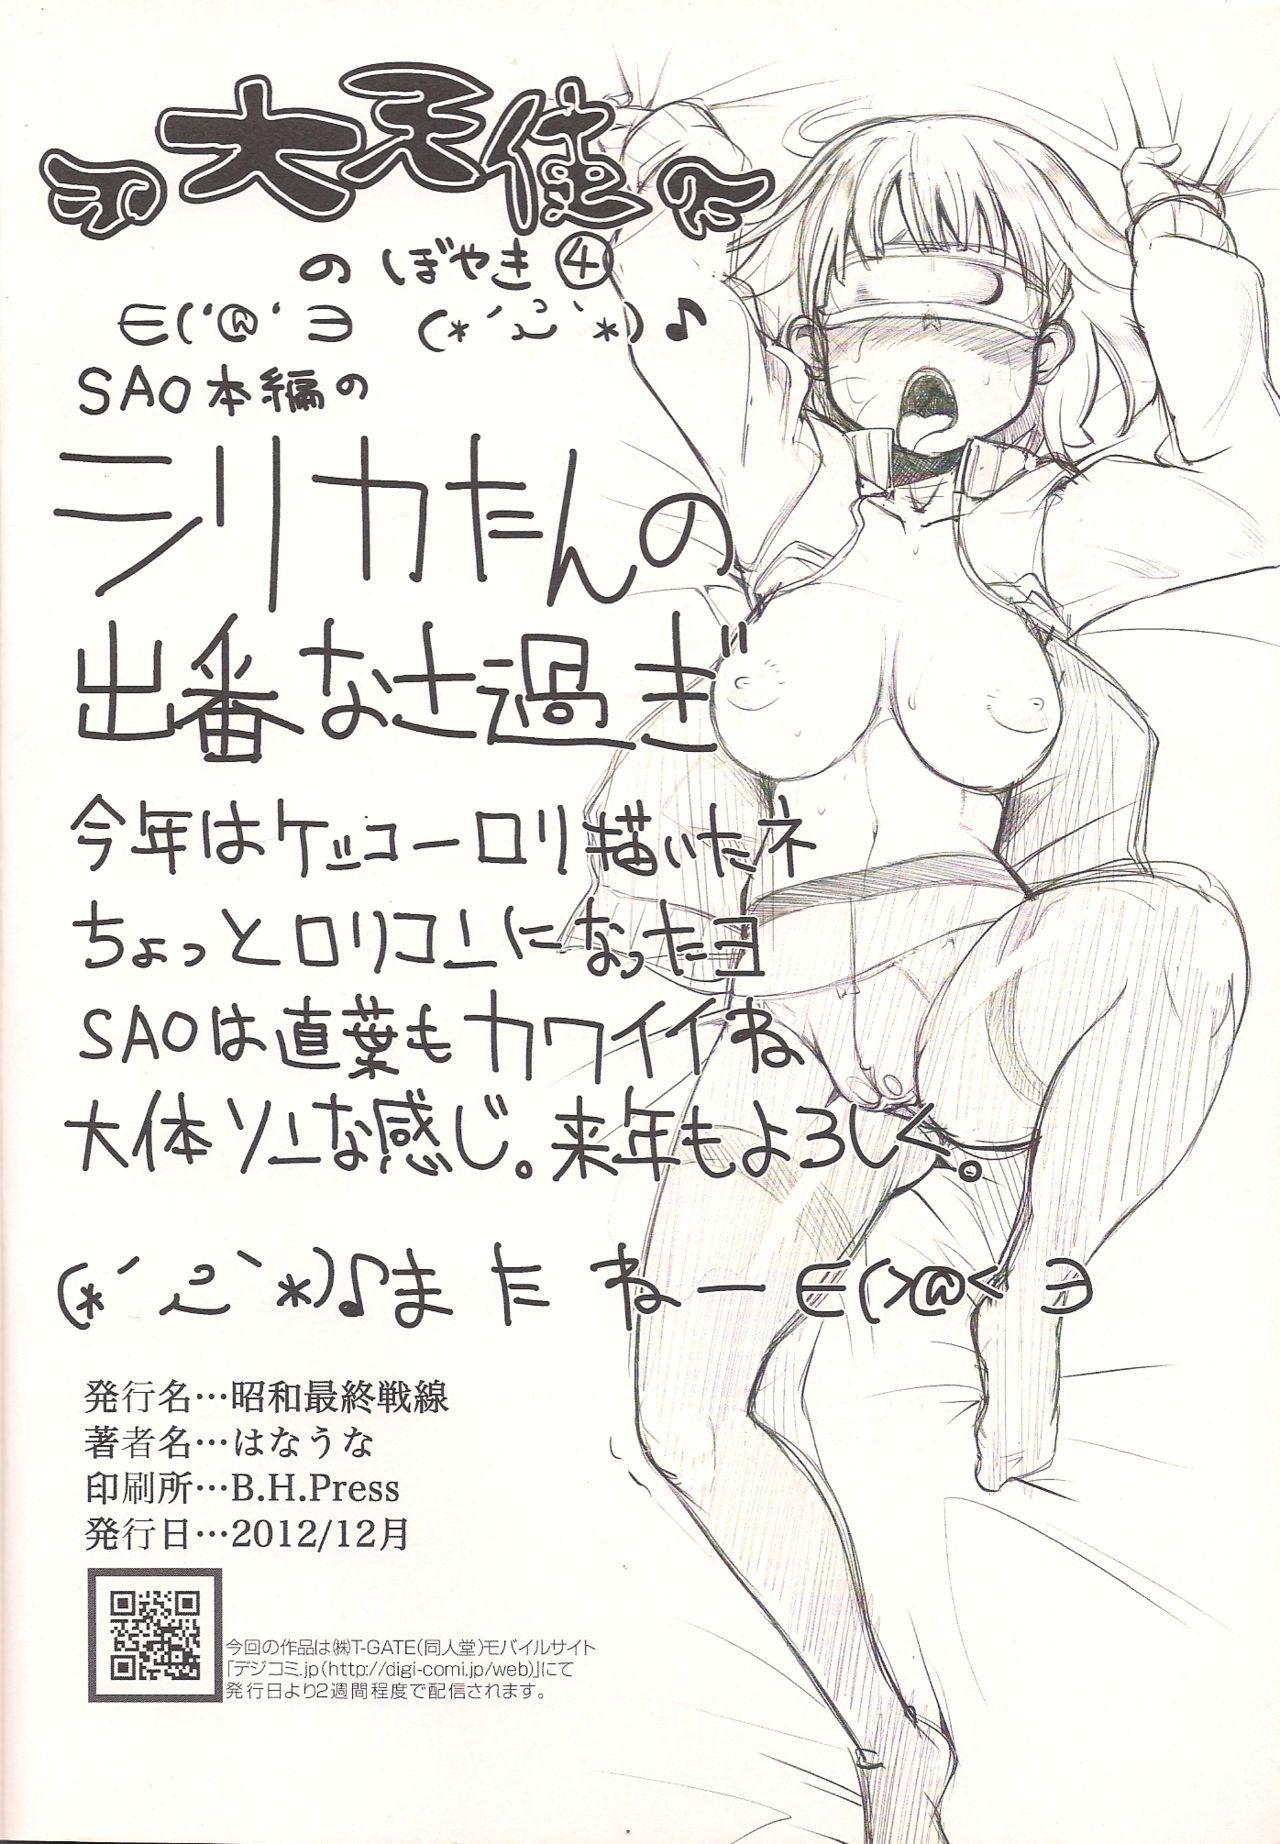 (C83) [Shouwa Saishuu Sensen (Hanauna)] Silica-tan Bibouroku. - My Sweet Silica Memorandum Record (Sword Art Online) 25